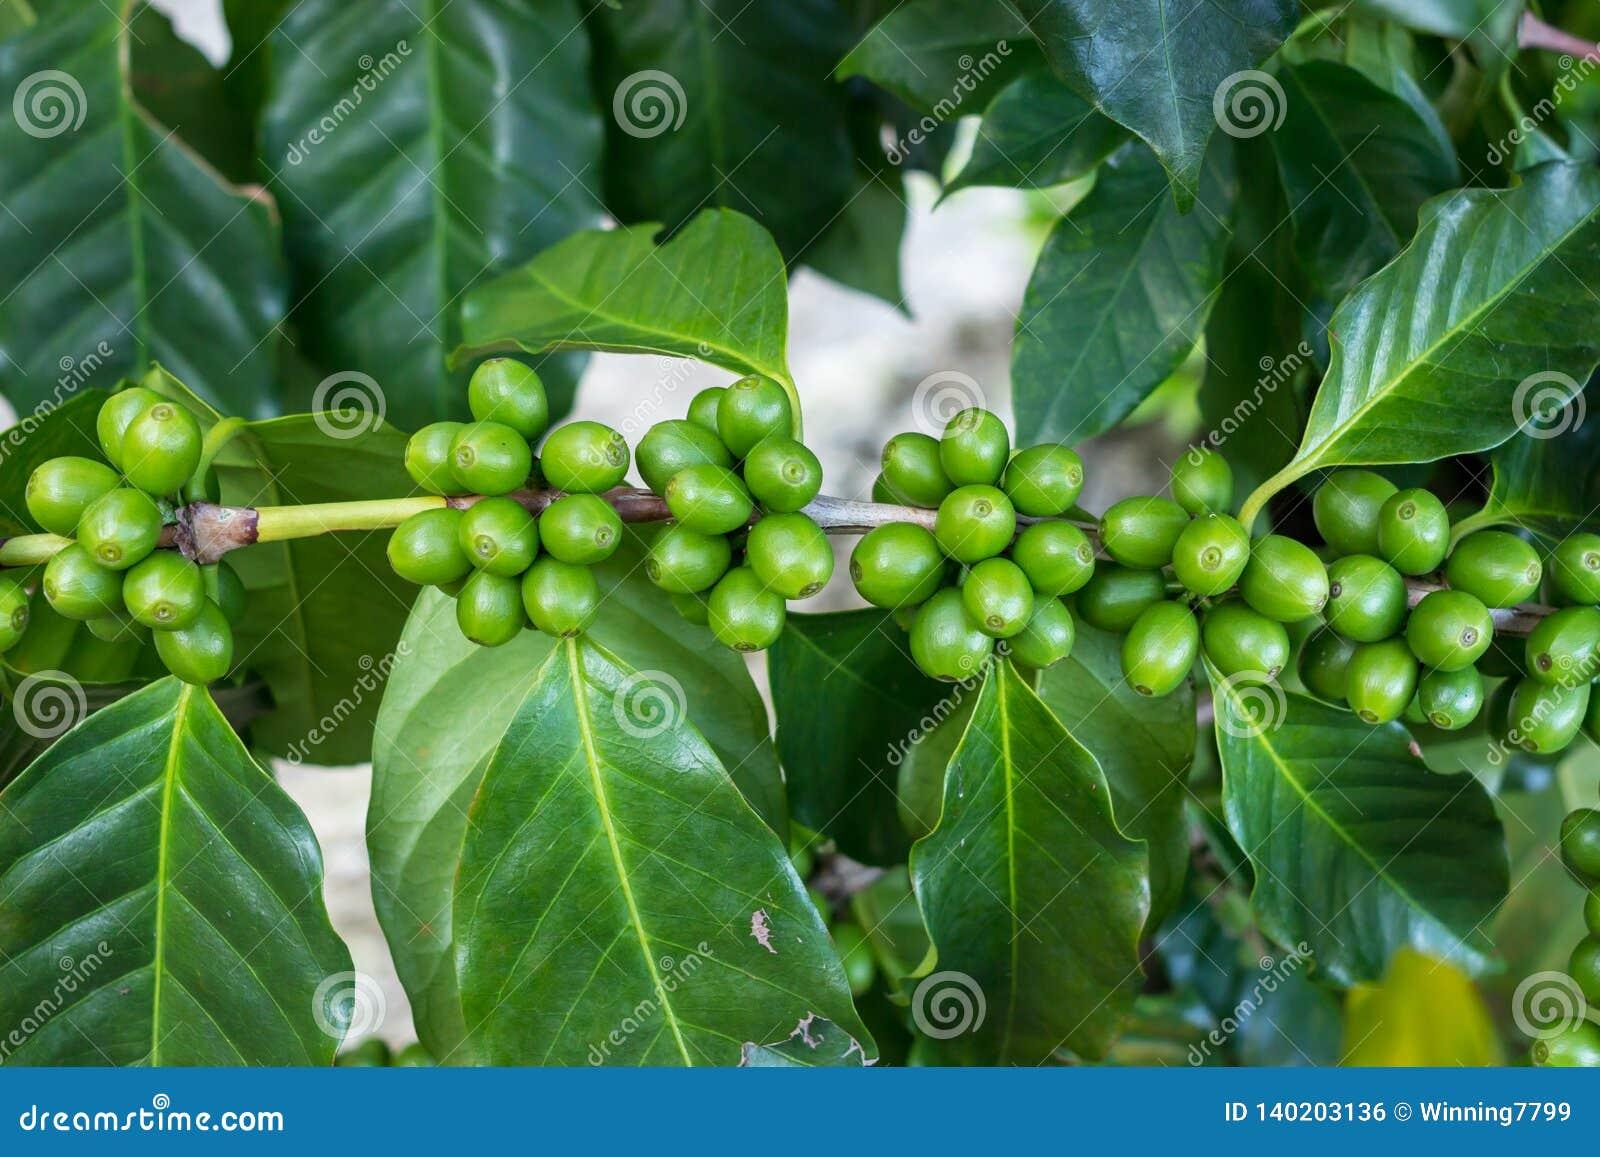 Organic Green Coffee Cherry Beans On Tree Stock Photo Image Of